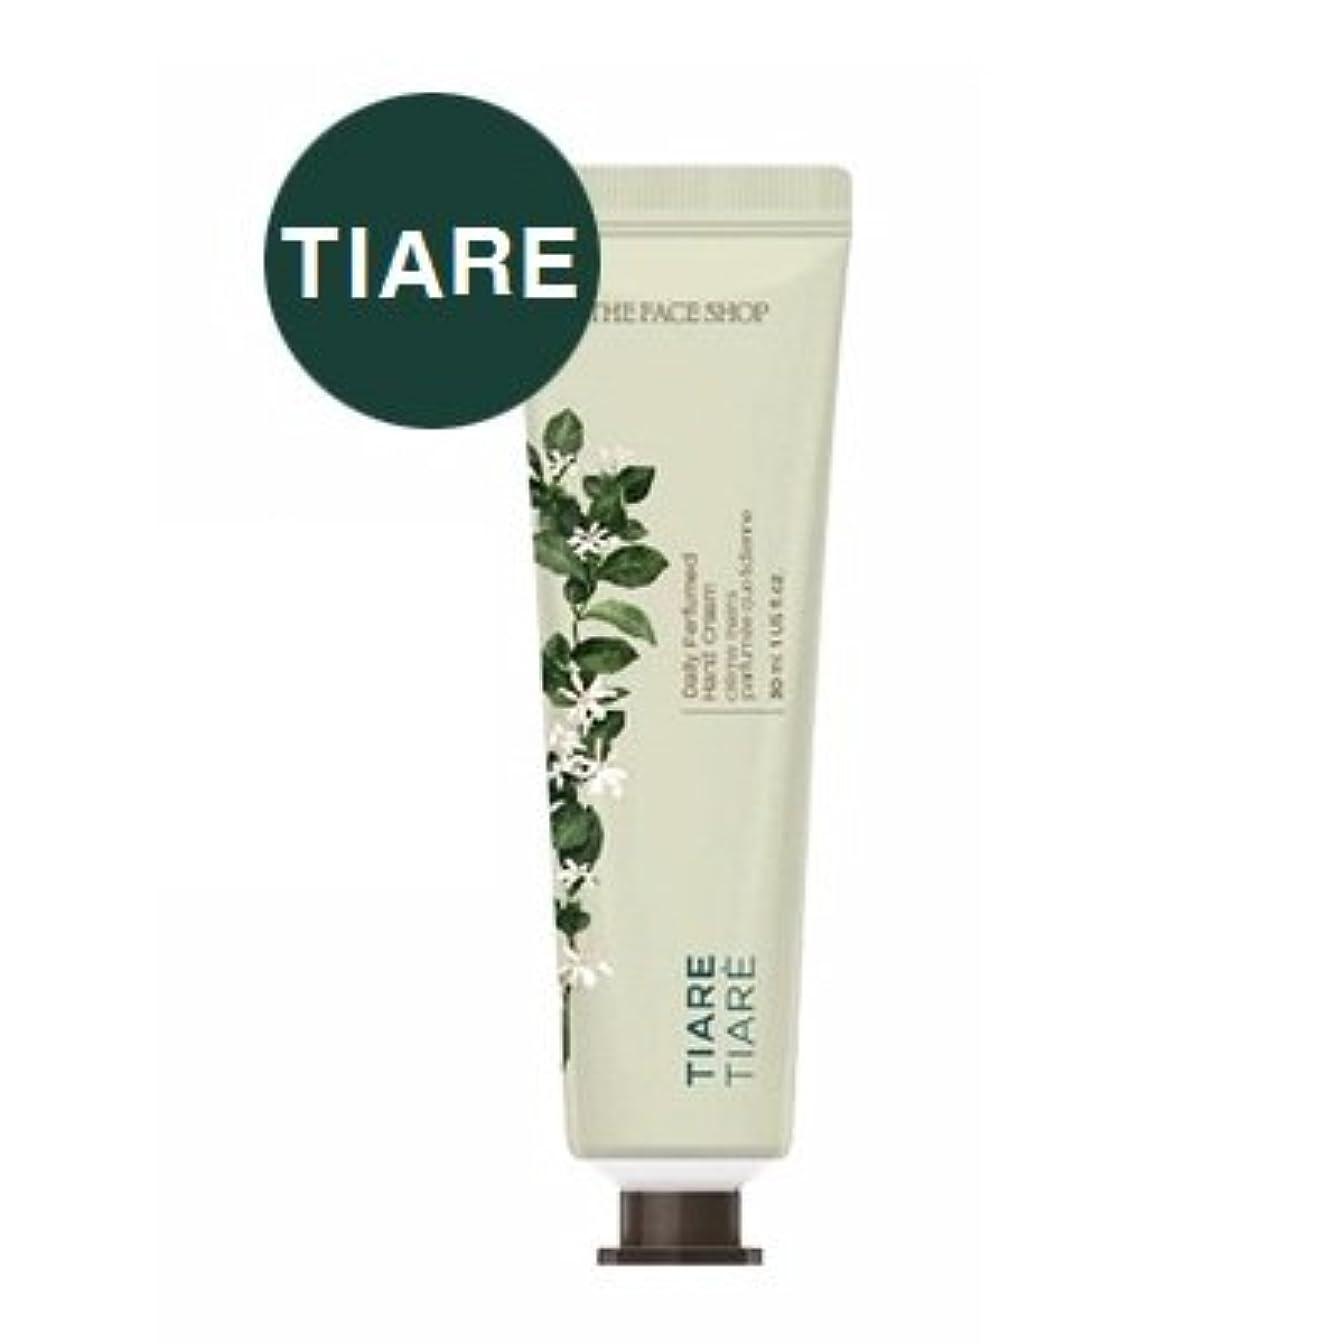 THE FACE SHOP Daily Perfume Hand Cream [02. Tiare] ザフェイスショップ デイリーパフュームハンドクリーム [02. ティアレ] [new] [並行輸入品]